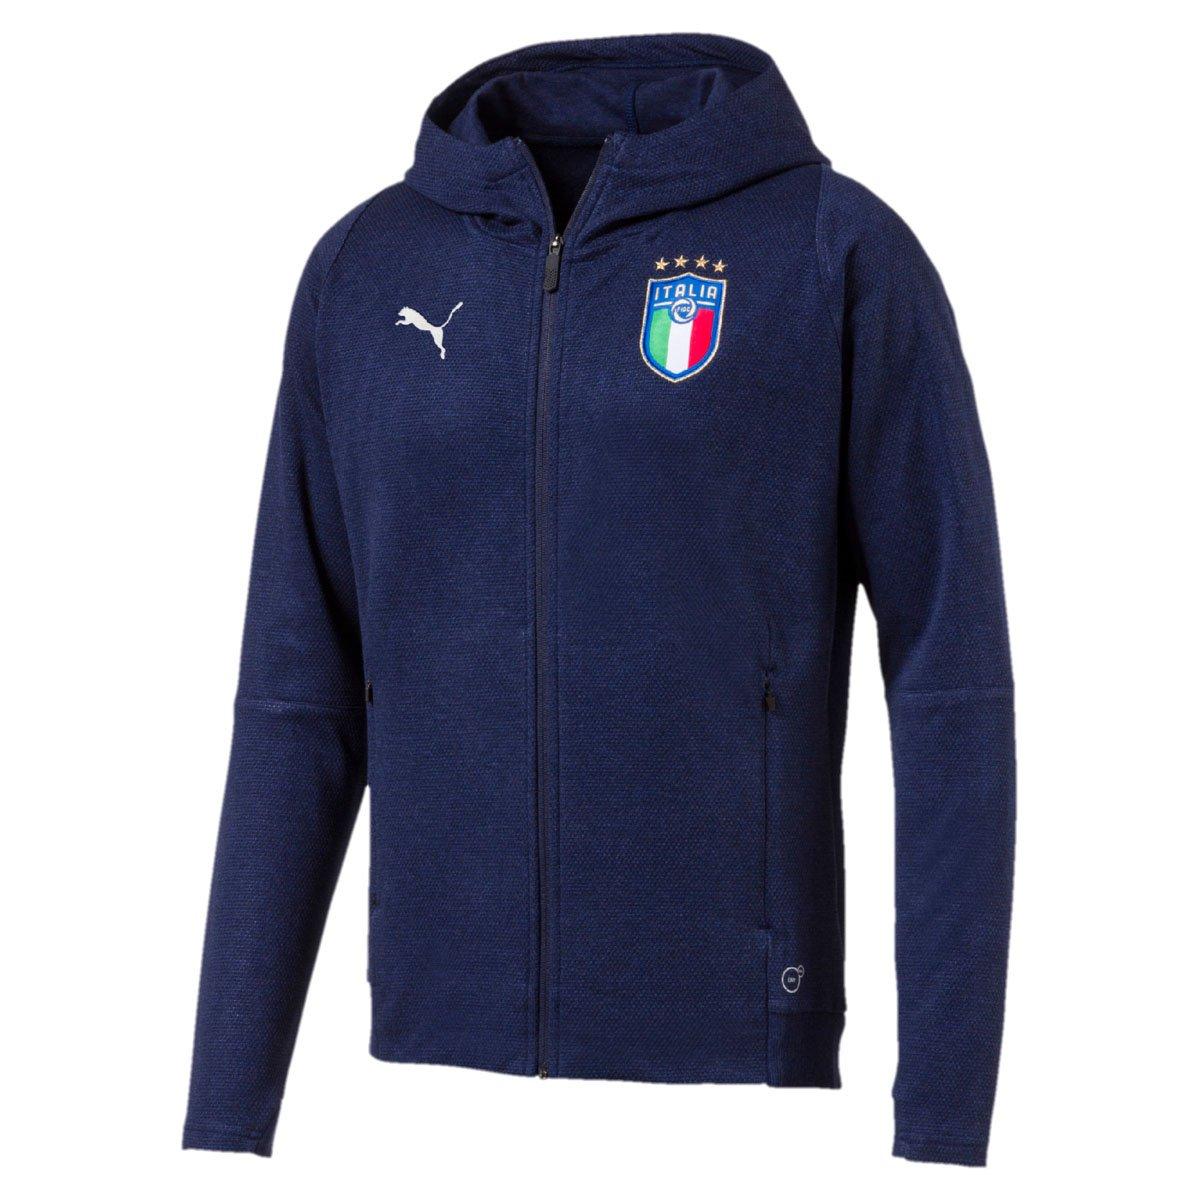 Puma mx Sears Caballero Entiende Soccer com Italia Me Sudadera wzqE4RUxn